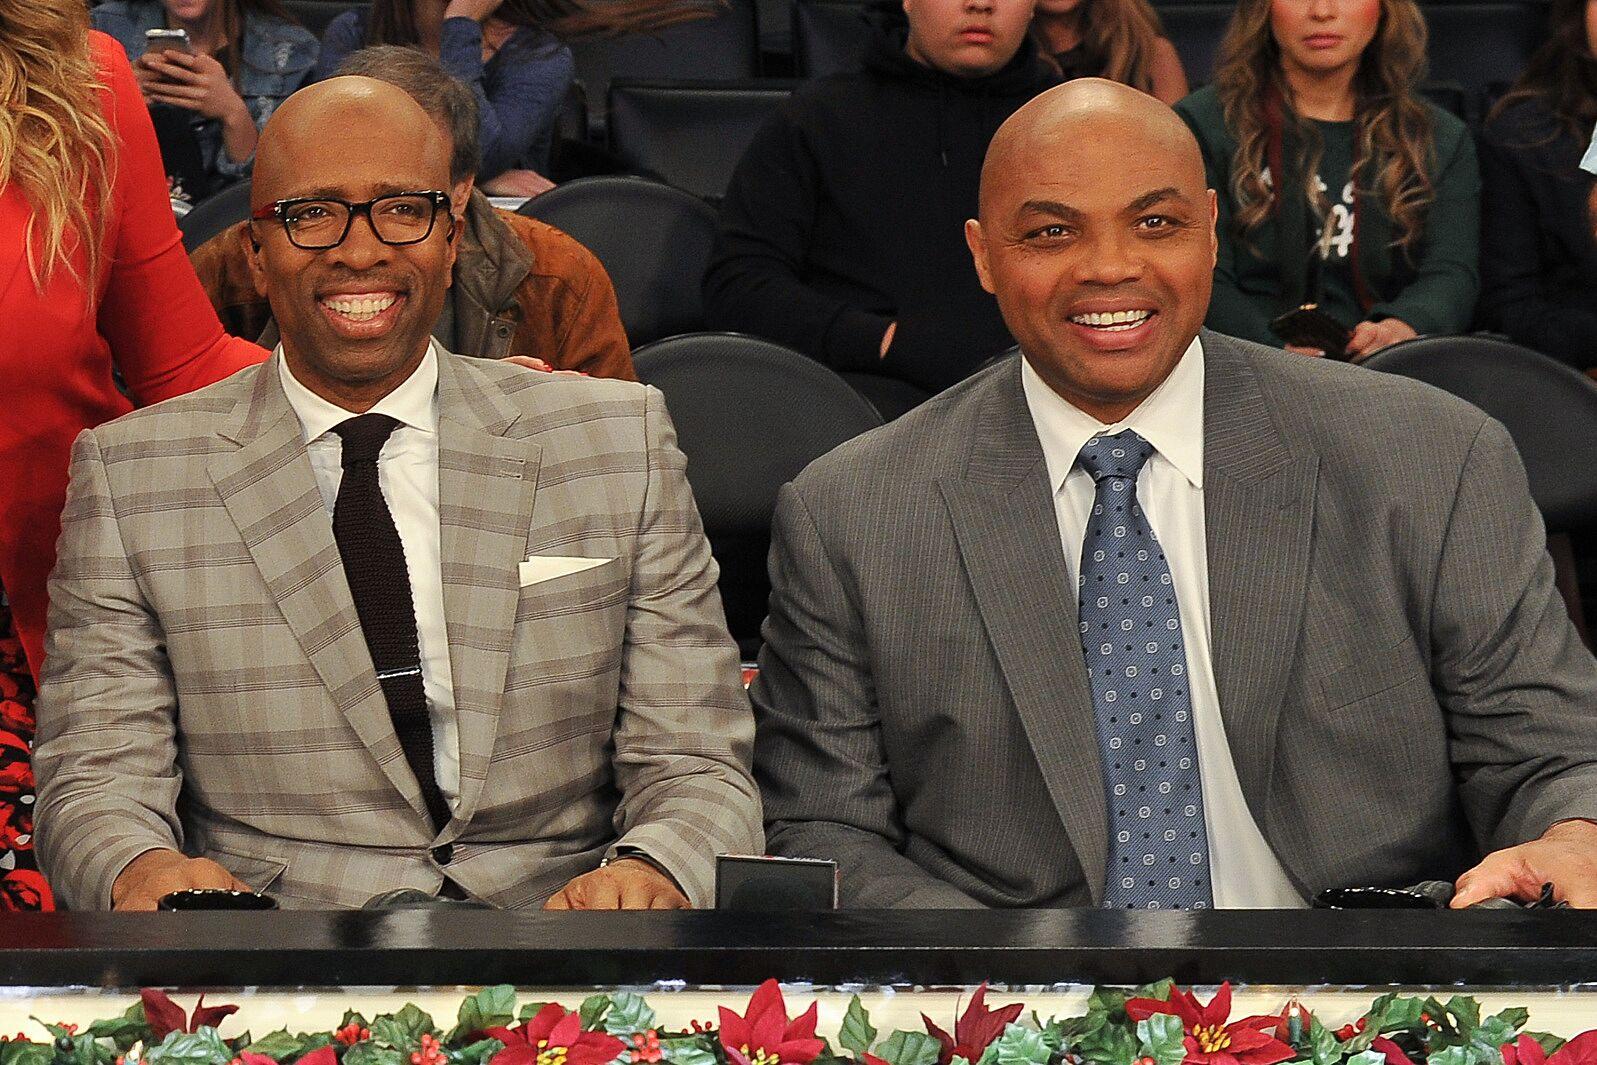 d2d95b649cb9 Los Angeles Lakers  Charles Barkley invites LeBron James onto TNT